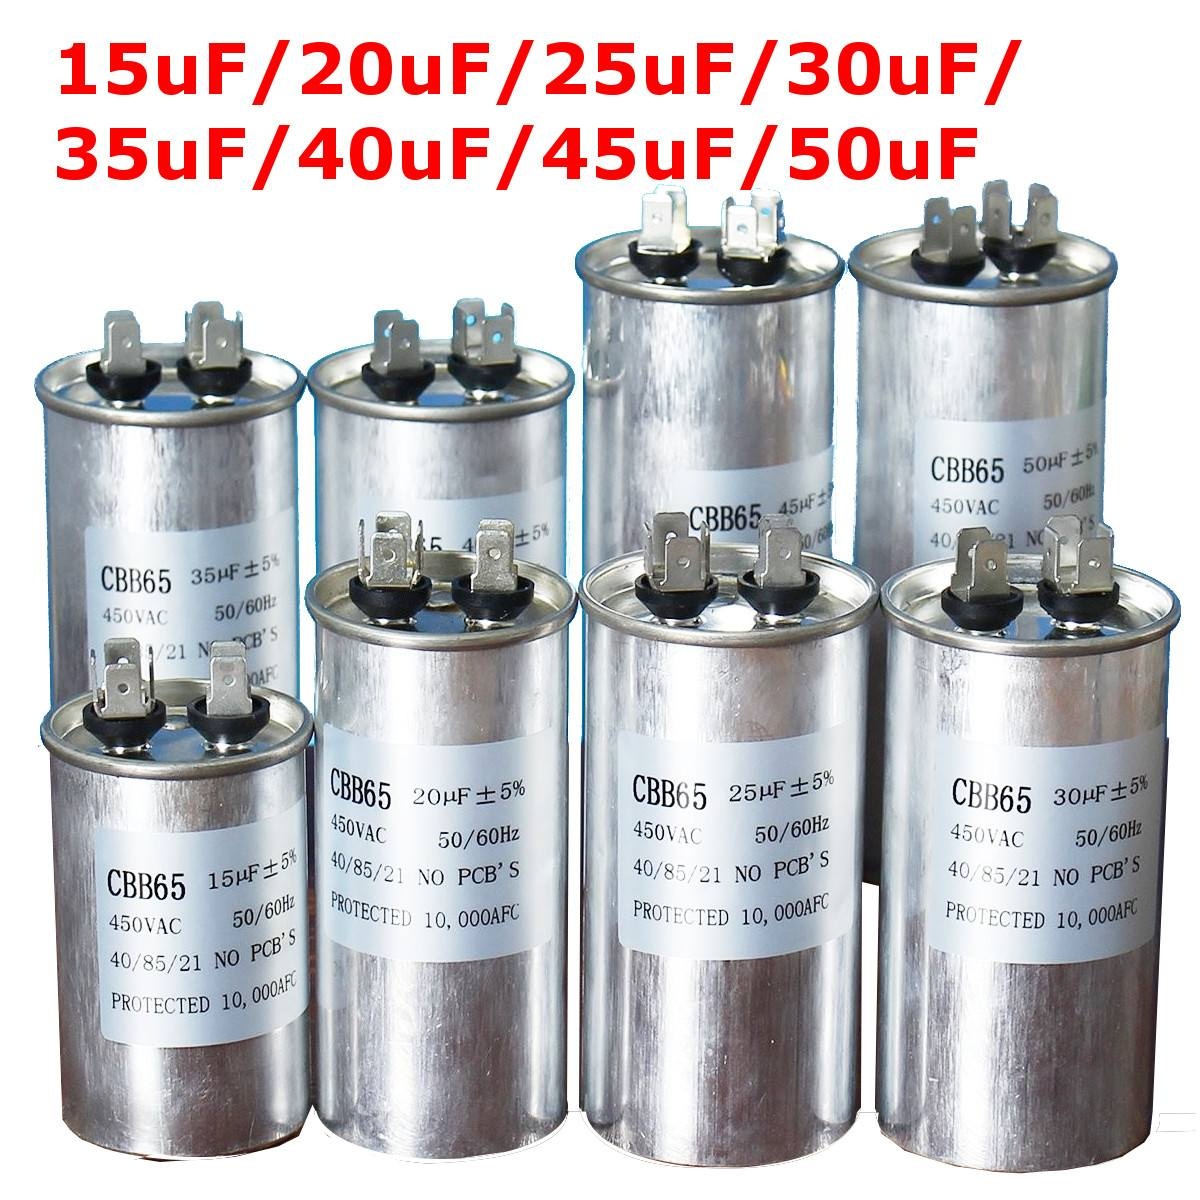 450V AC Motor Capacitor Air Conditioner Compressor Start Capacitor CBB65 15uF 20uF 25uF 30uF 35uF 40uF 45uF 50uF Air Conditionin